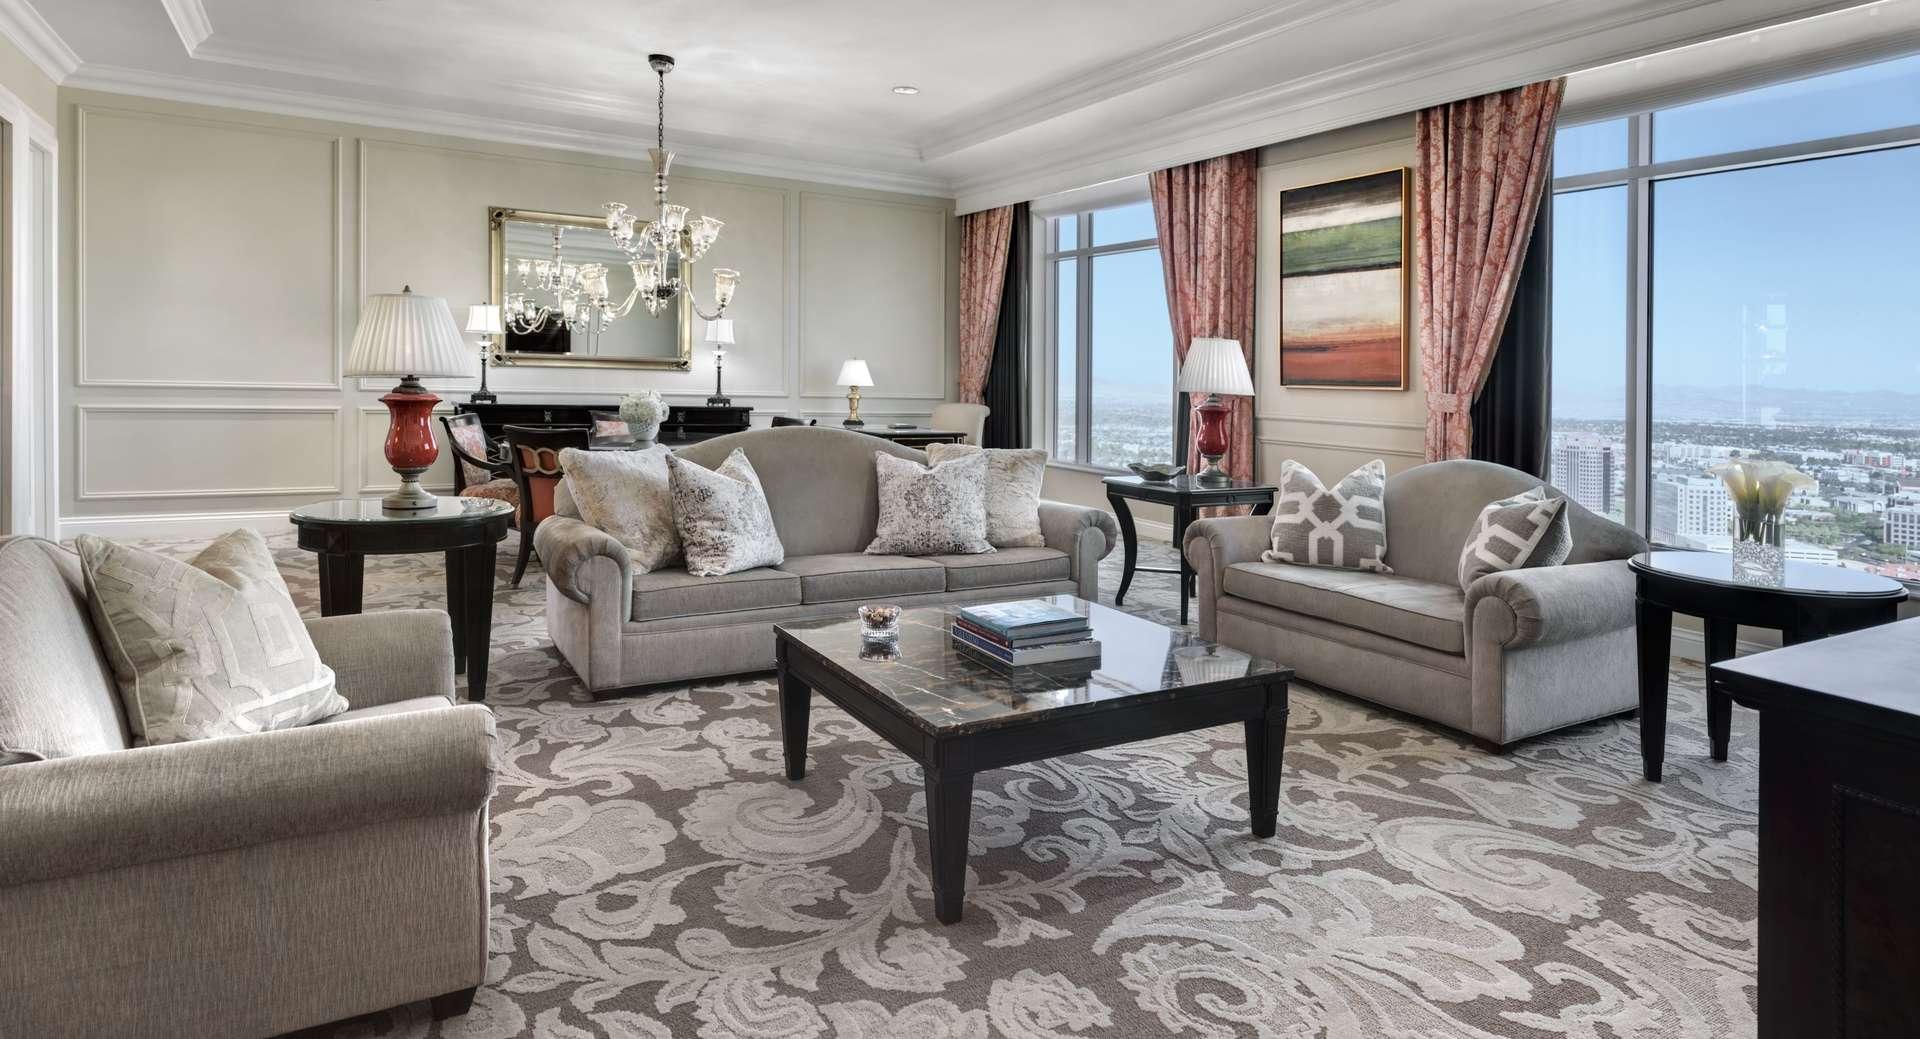 Luxury vacation rentals usa - Nevada - Las vegas - The venetian - Venetian Executive King - Image 1/15